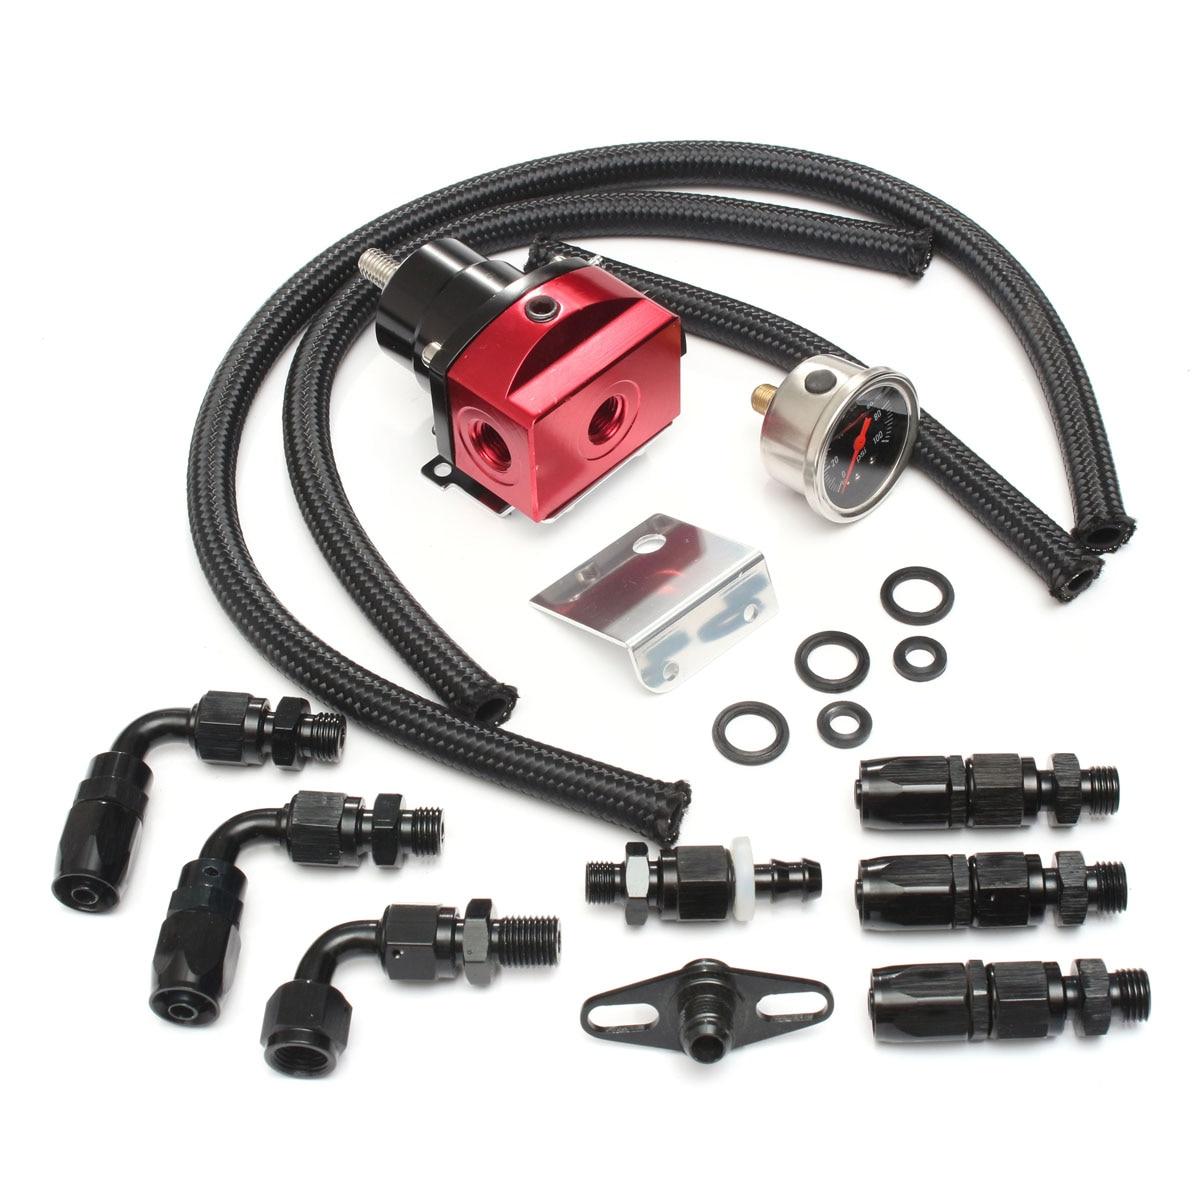 Racing Car Billet Fuel Pressure Regulator Guage Kit Oil Line 100PSI Guage fpr AN6 Oil Hose Fitting EFI